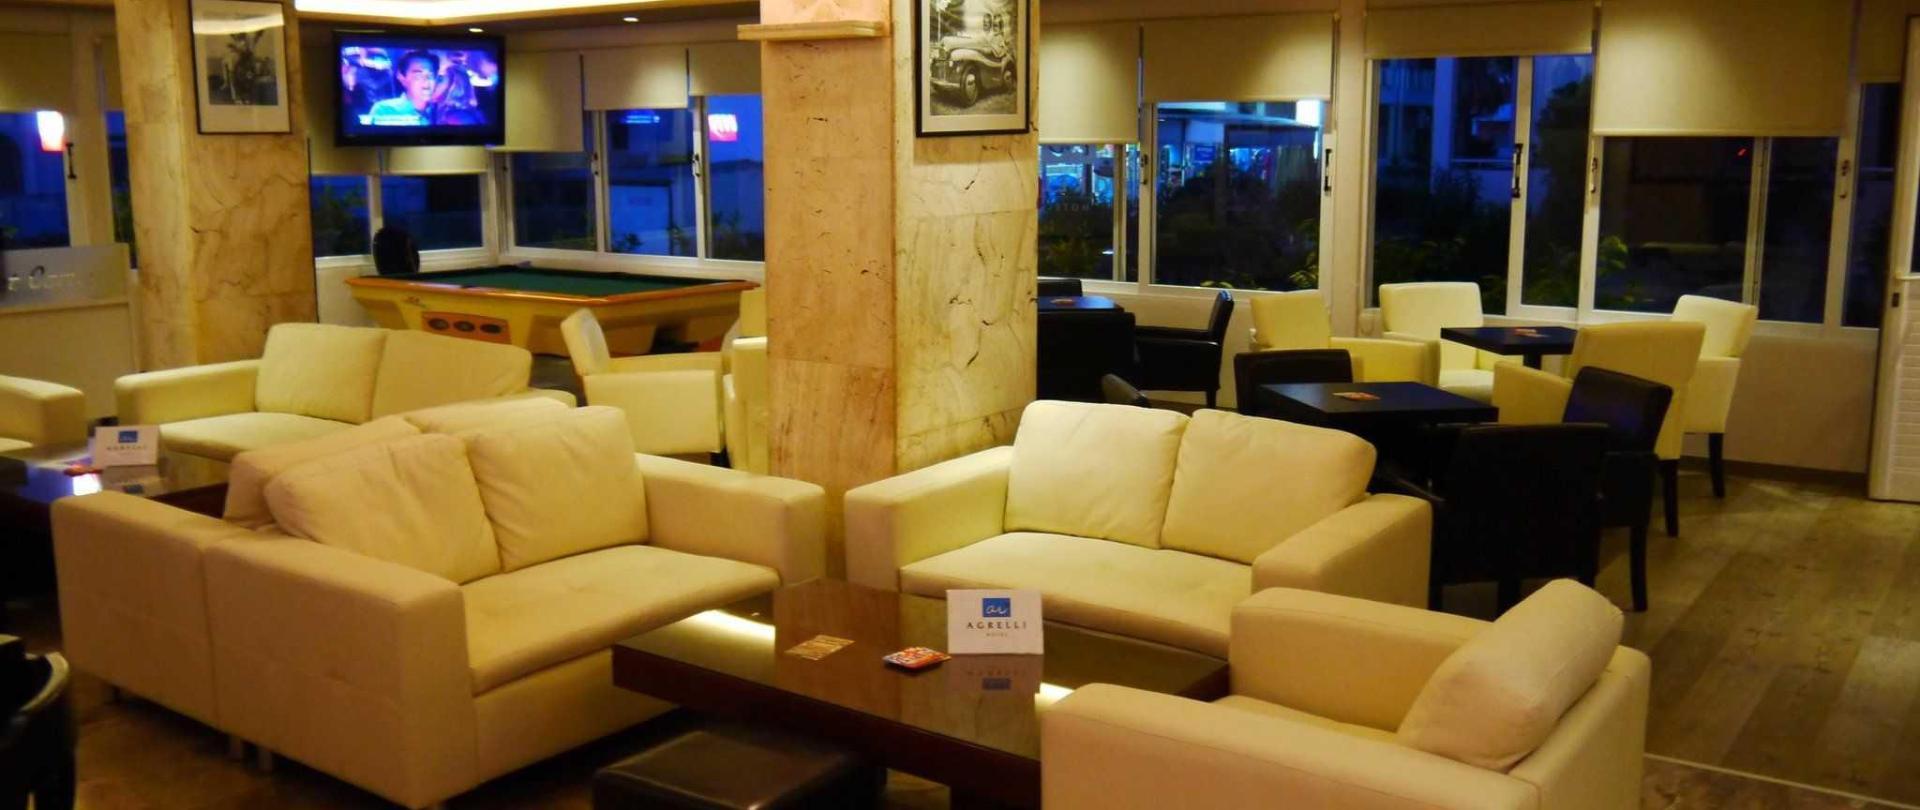 lounge-bar-1.jpg